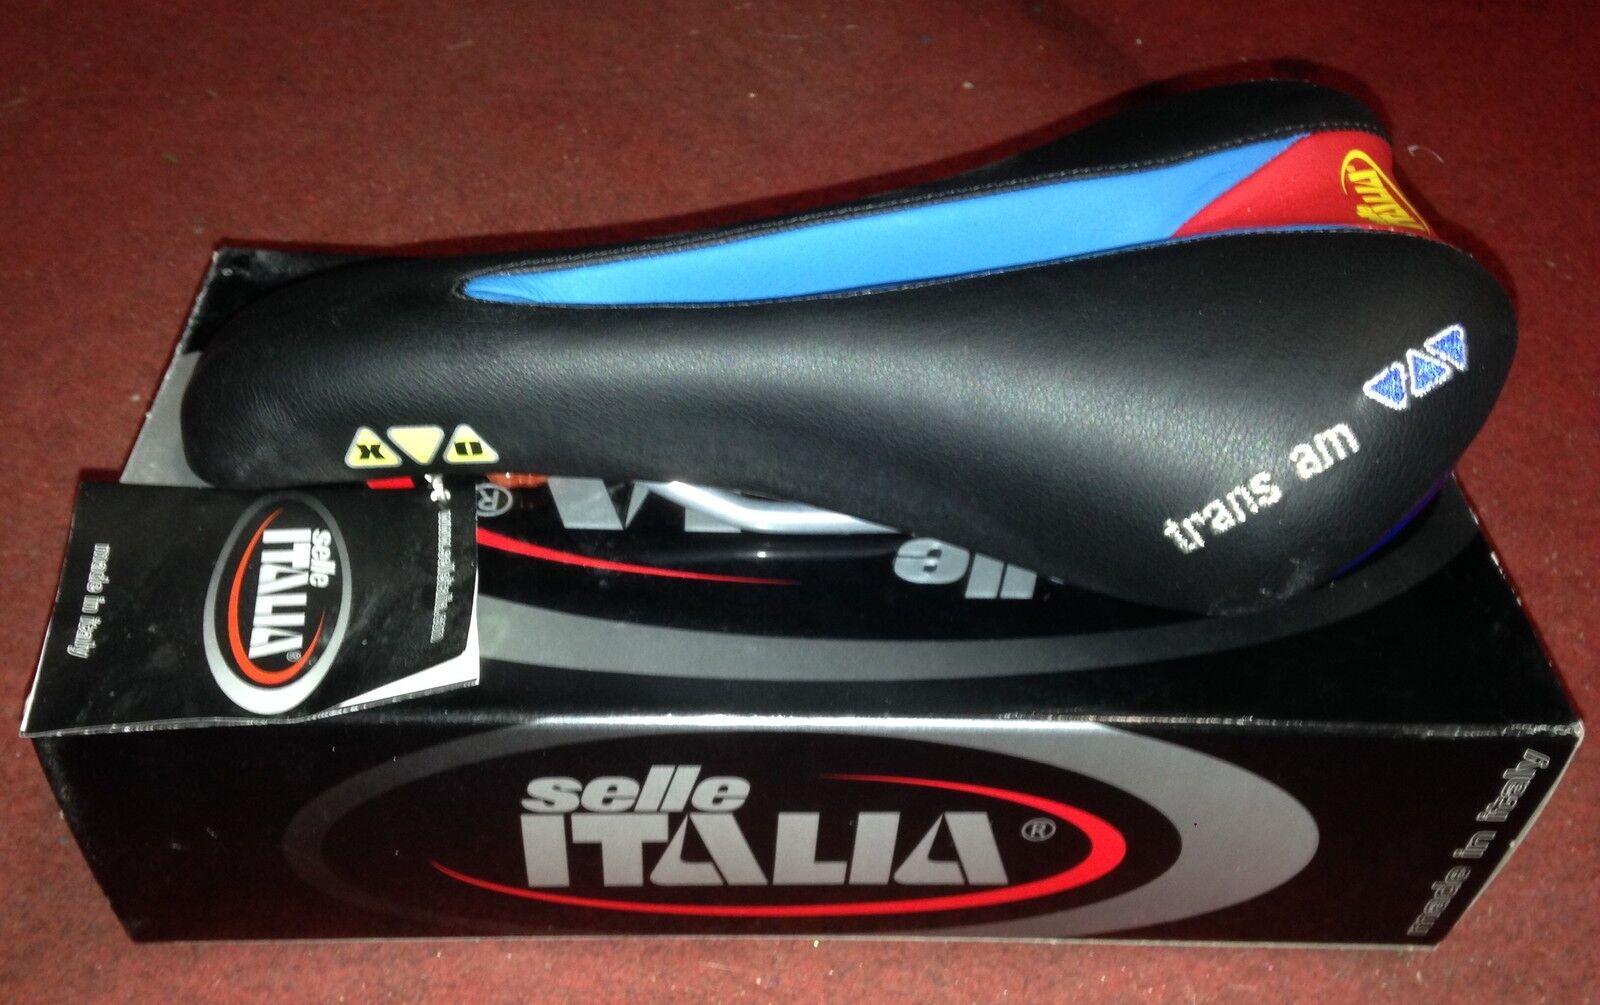 Sella bici Selle Italia X0 Trans Am Manganese bike  Saddle Seat fahrradsattle b  manufacturers direct supply